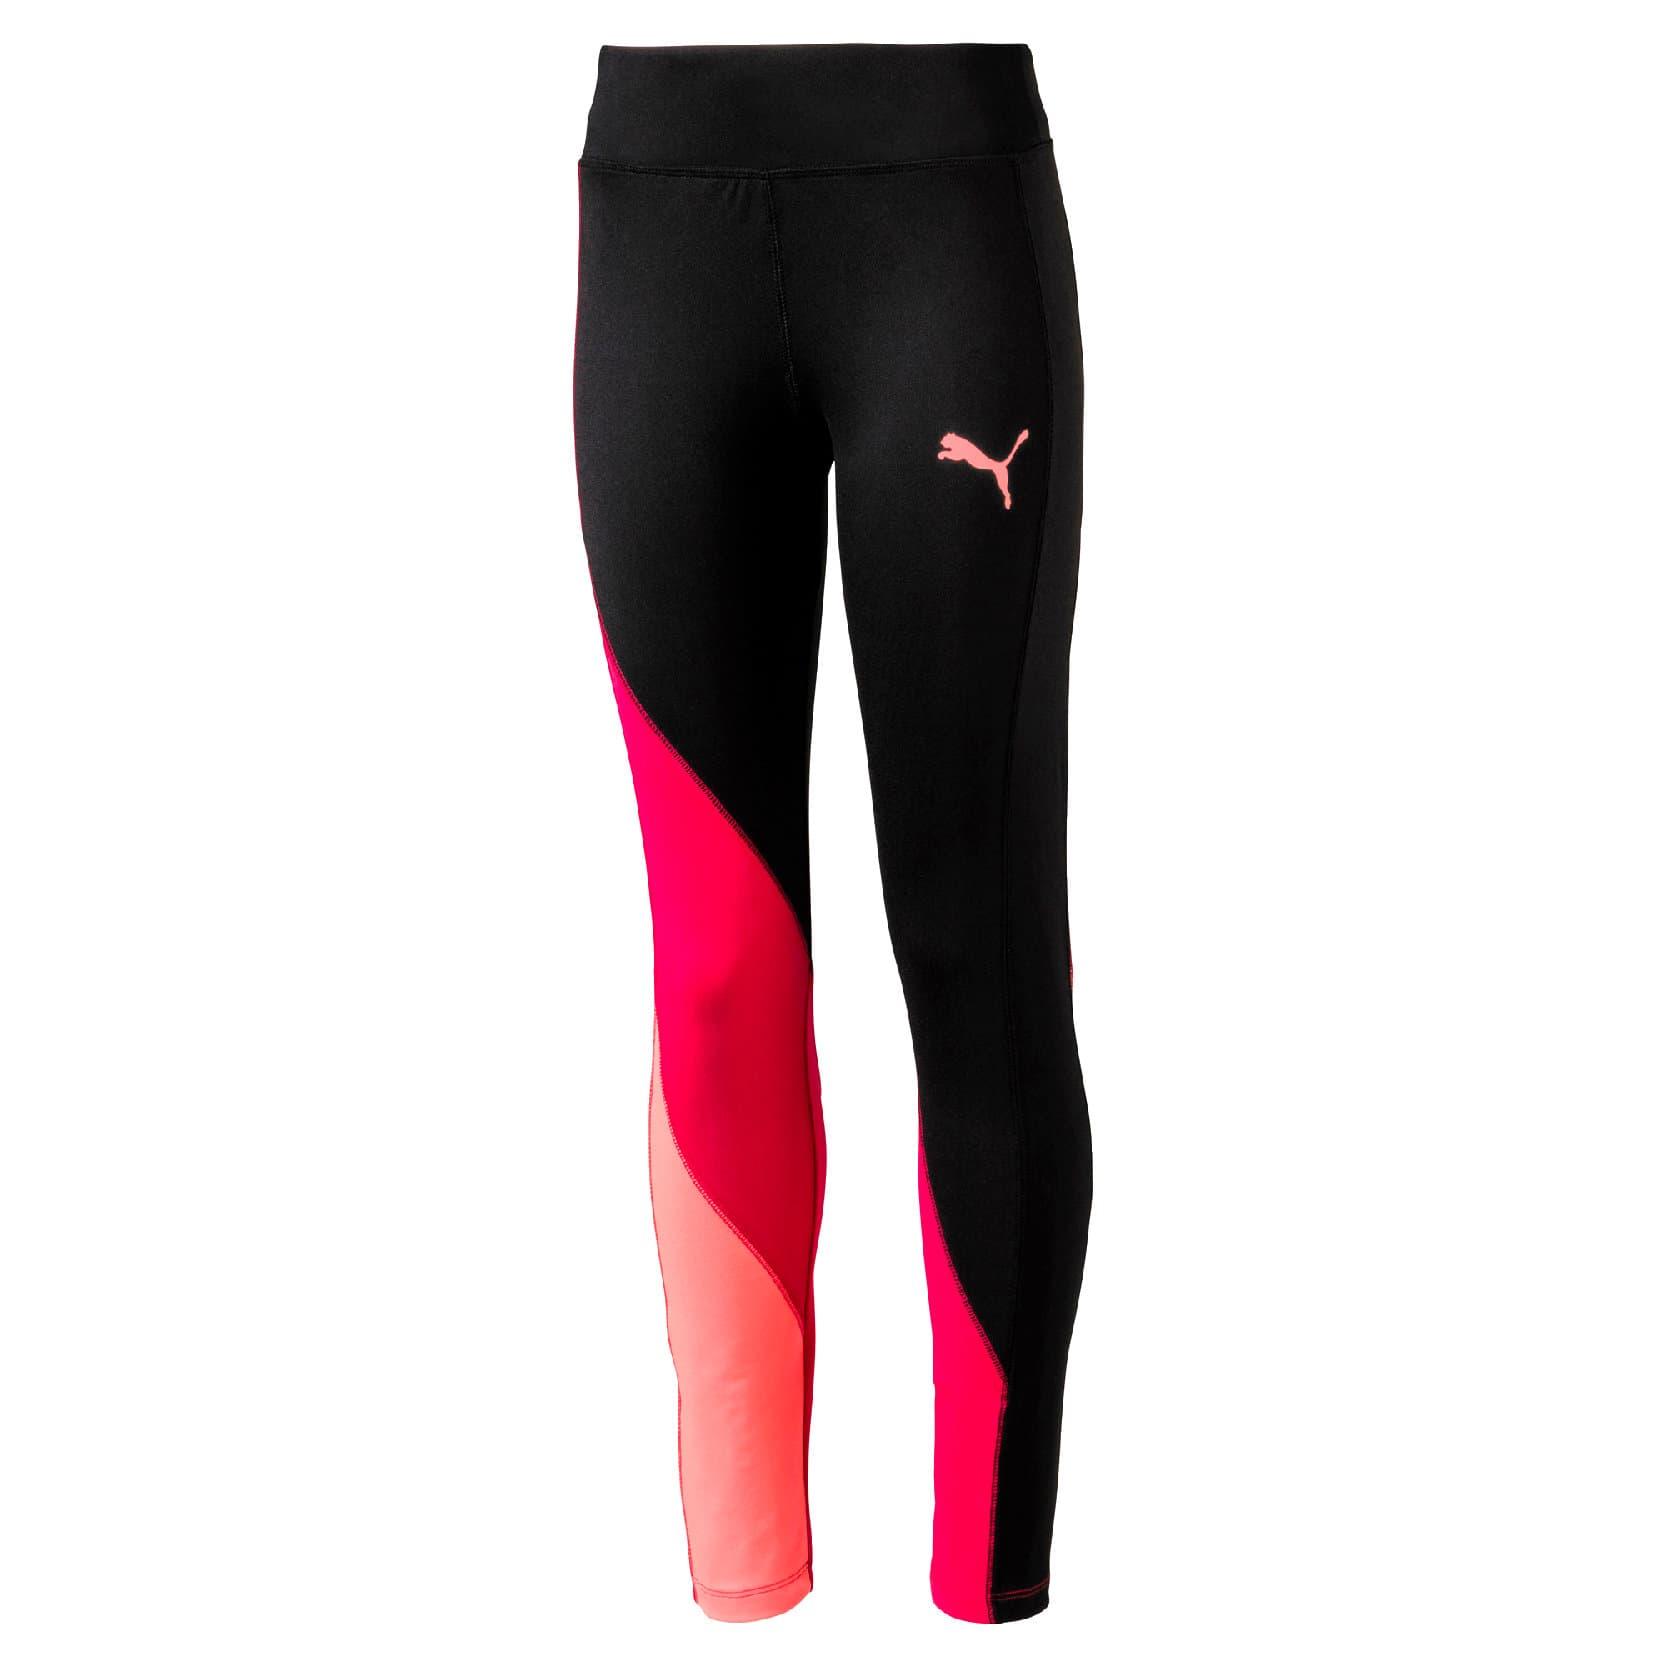 puma softsport leggings leggings pour fille migipedia. Black Bedroom Furniture Sets. Home Design Ideas